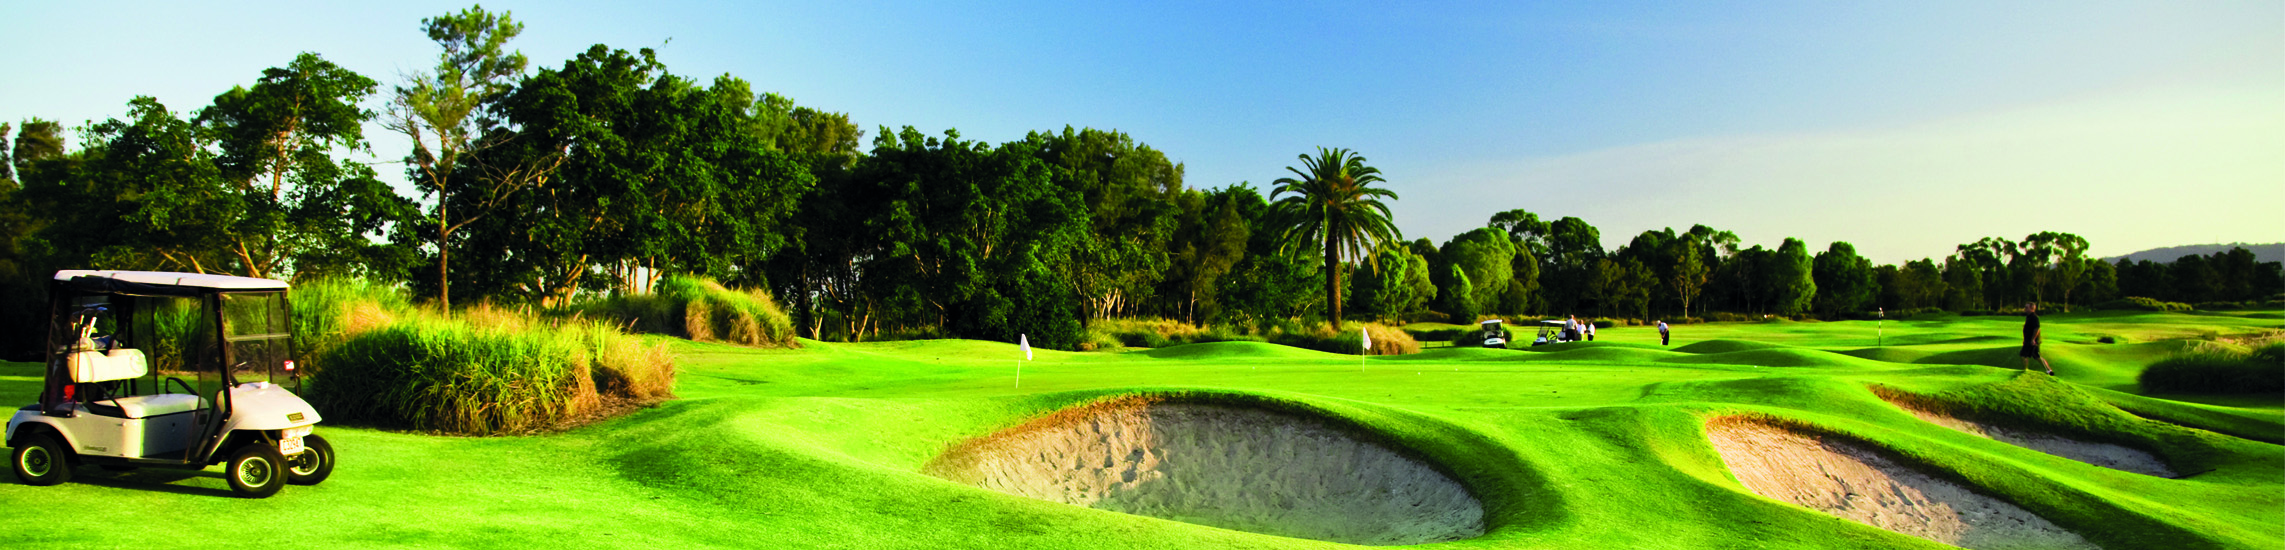 golfmedia-schranner-panorama-1